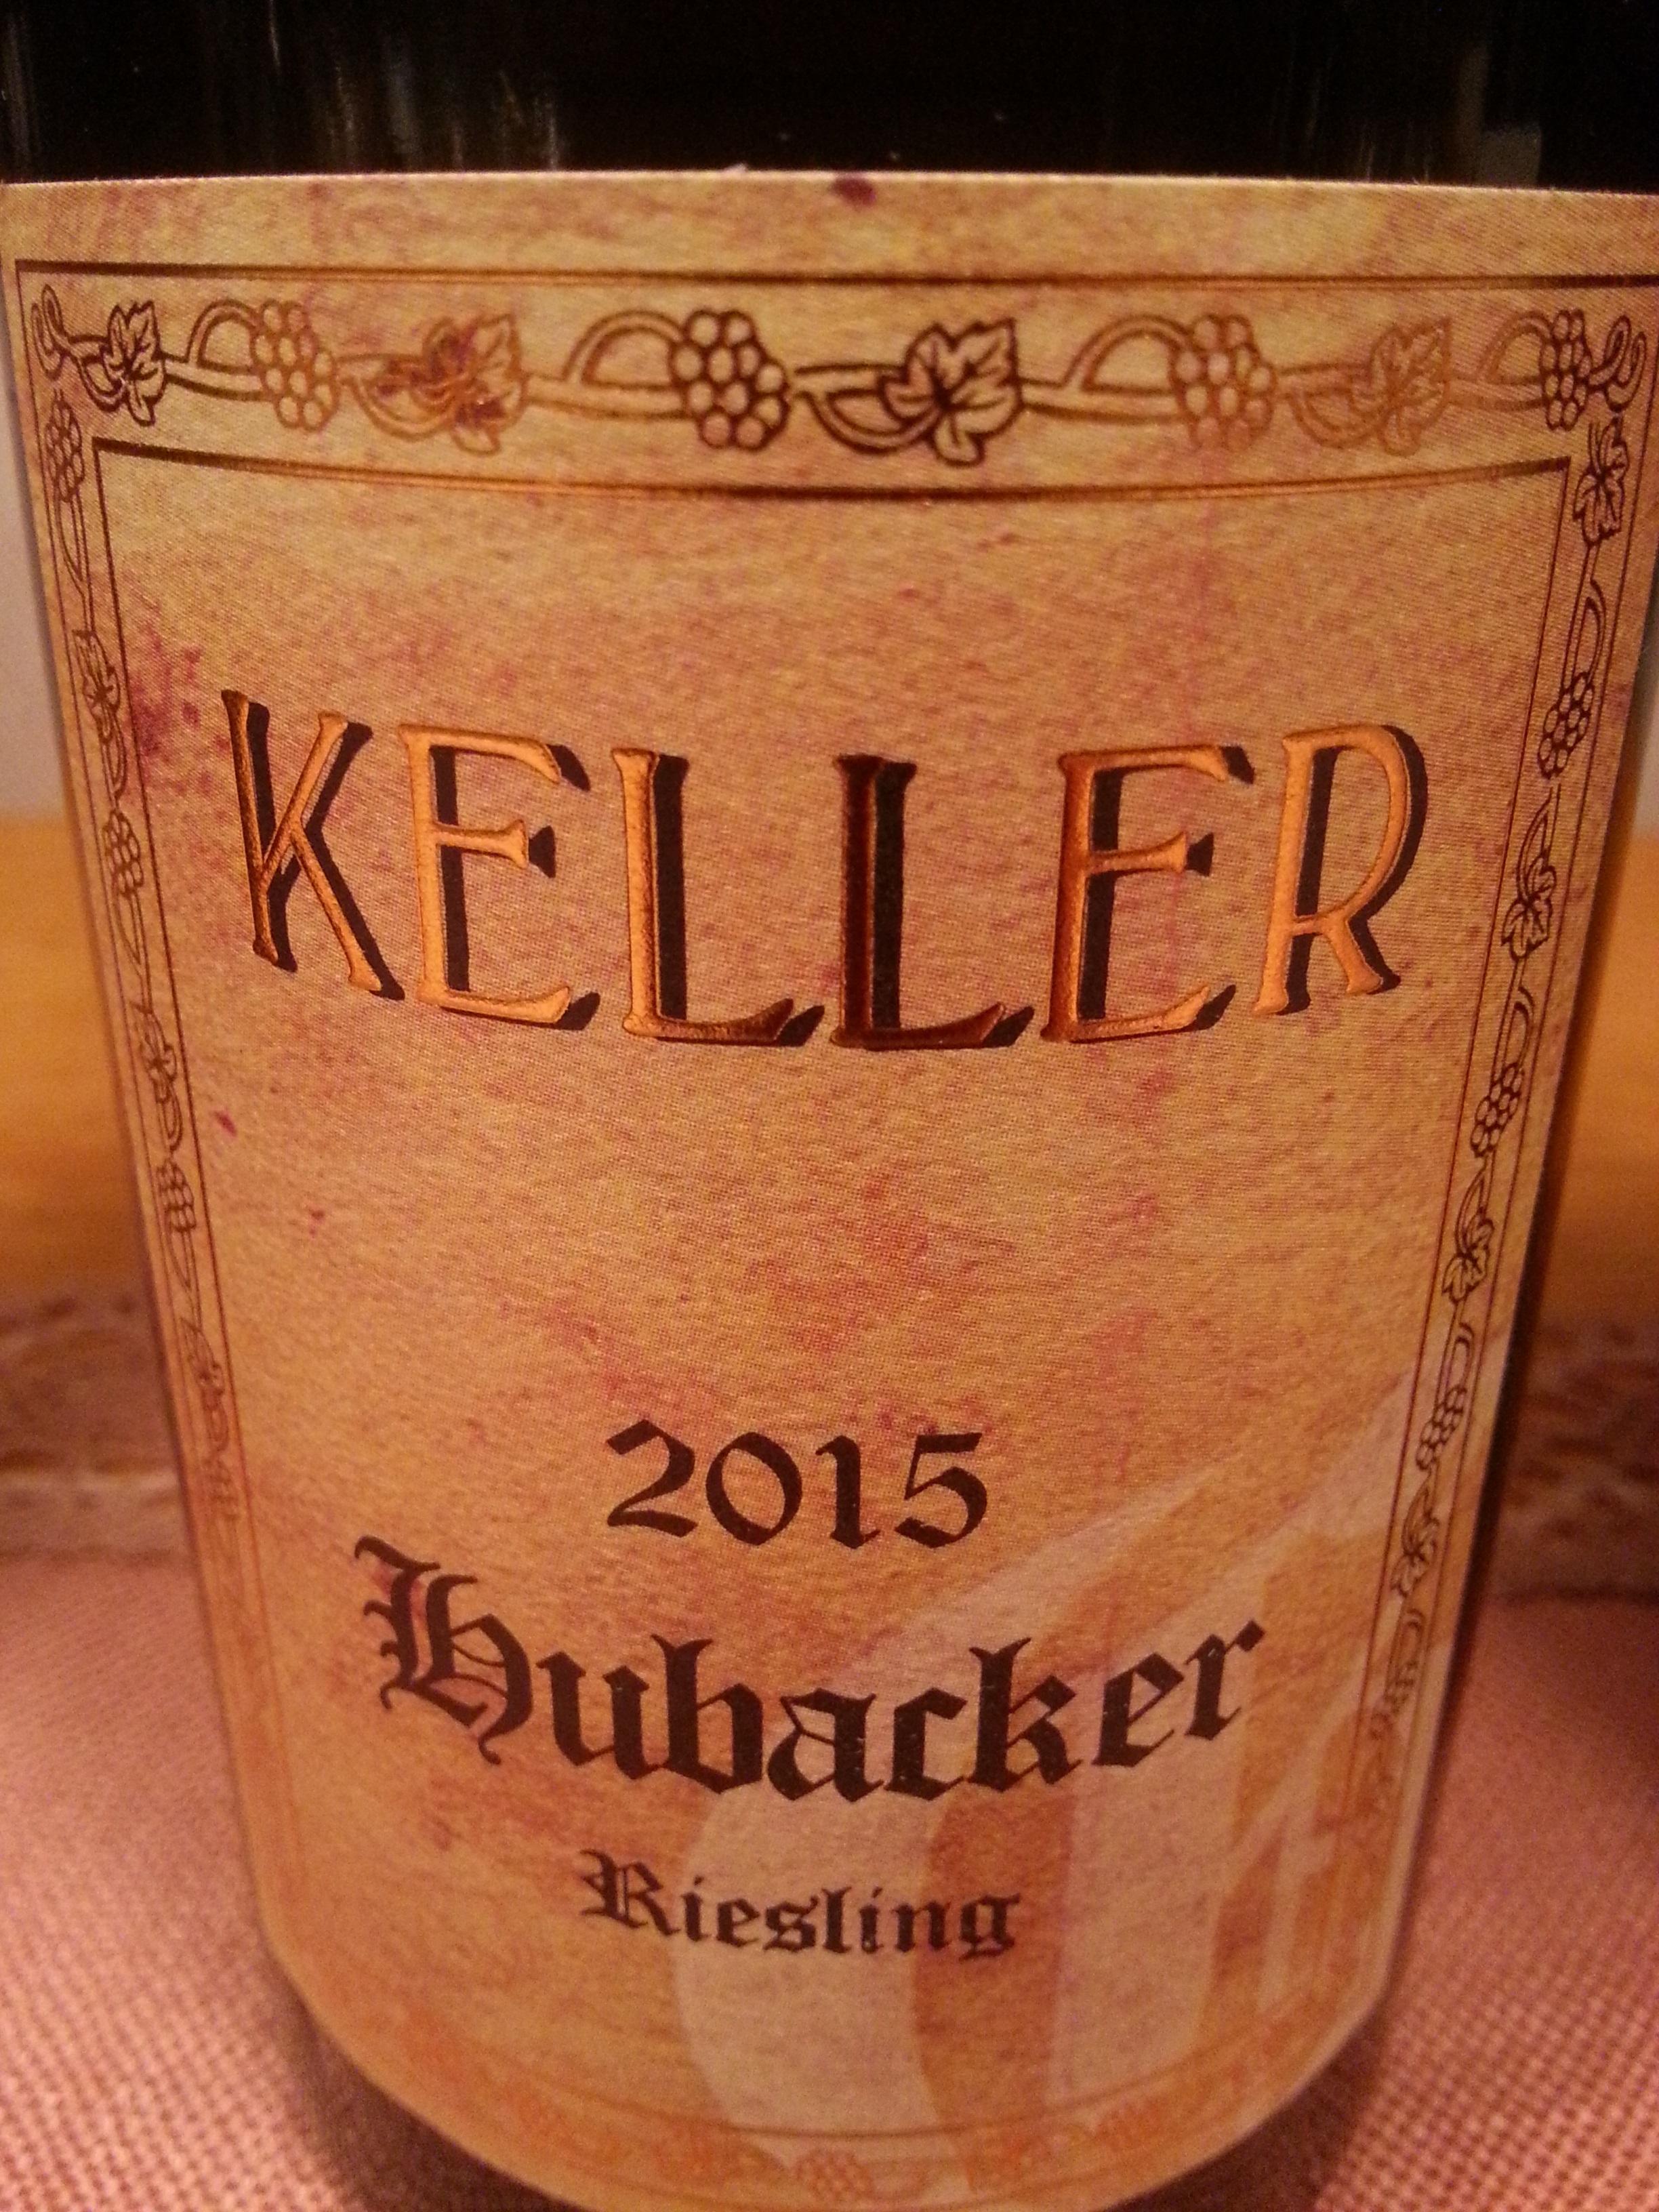 2015 Riesling Hubacker GG   Keller